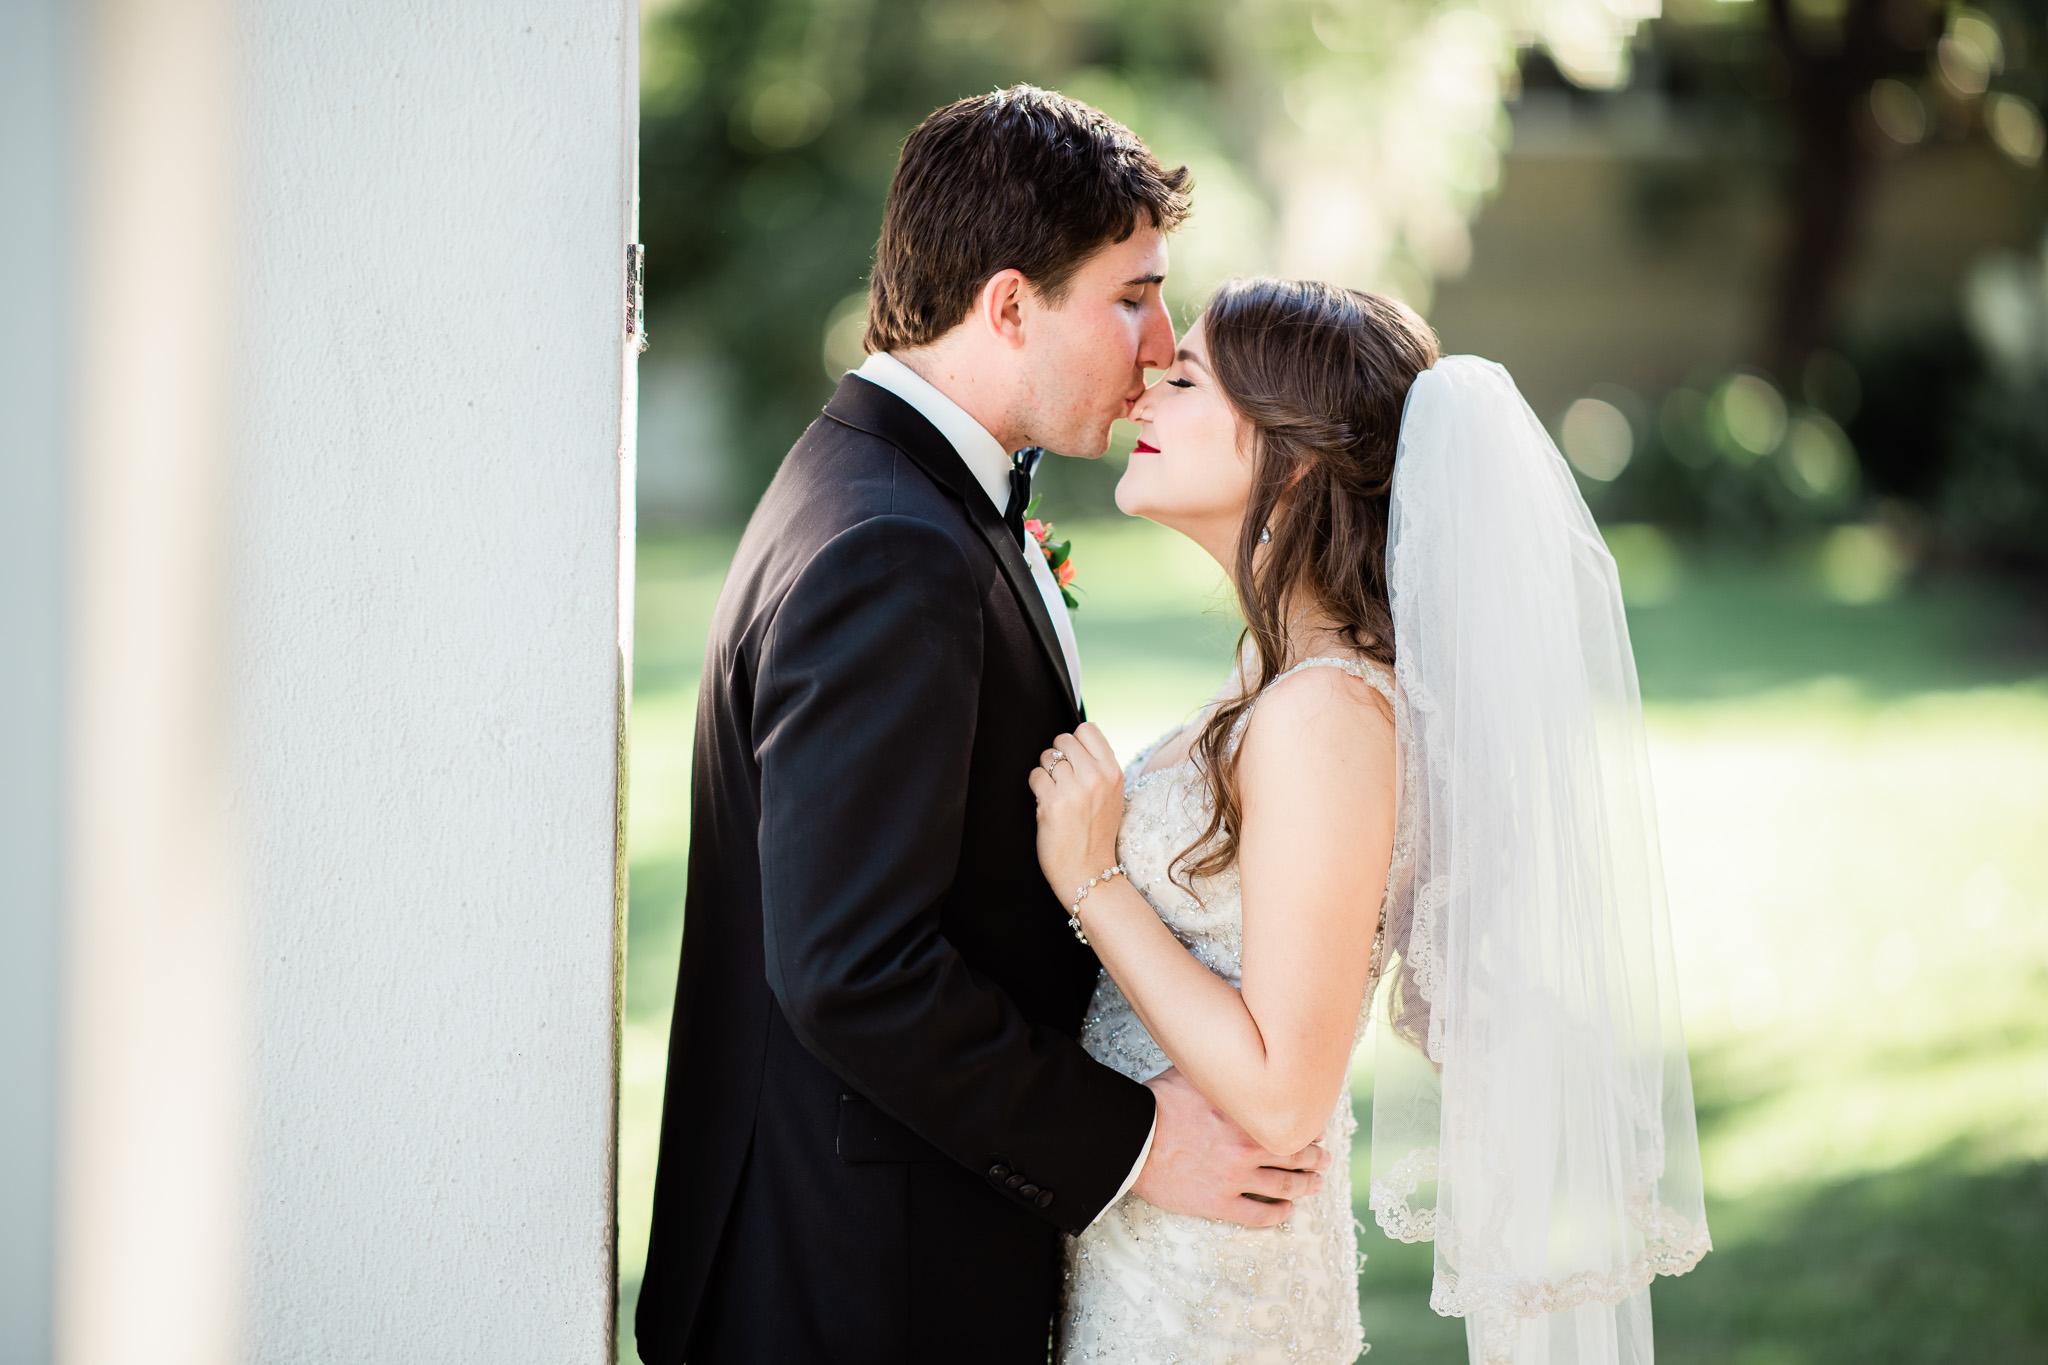 TAMPA_WEDDING_PHOTOGRAPHER_MPMZ_D82_2594_0068.jpg